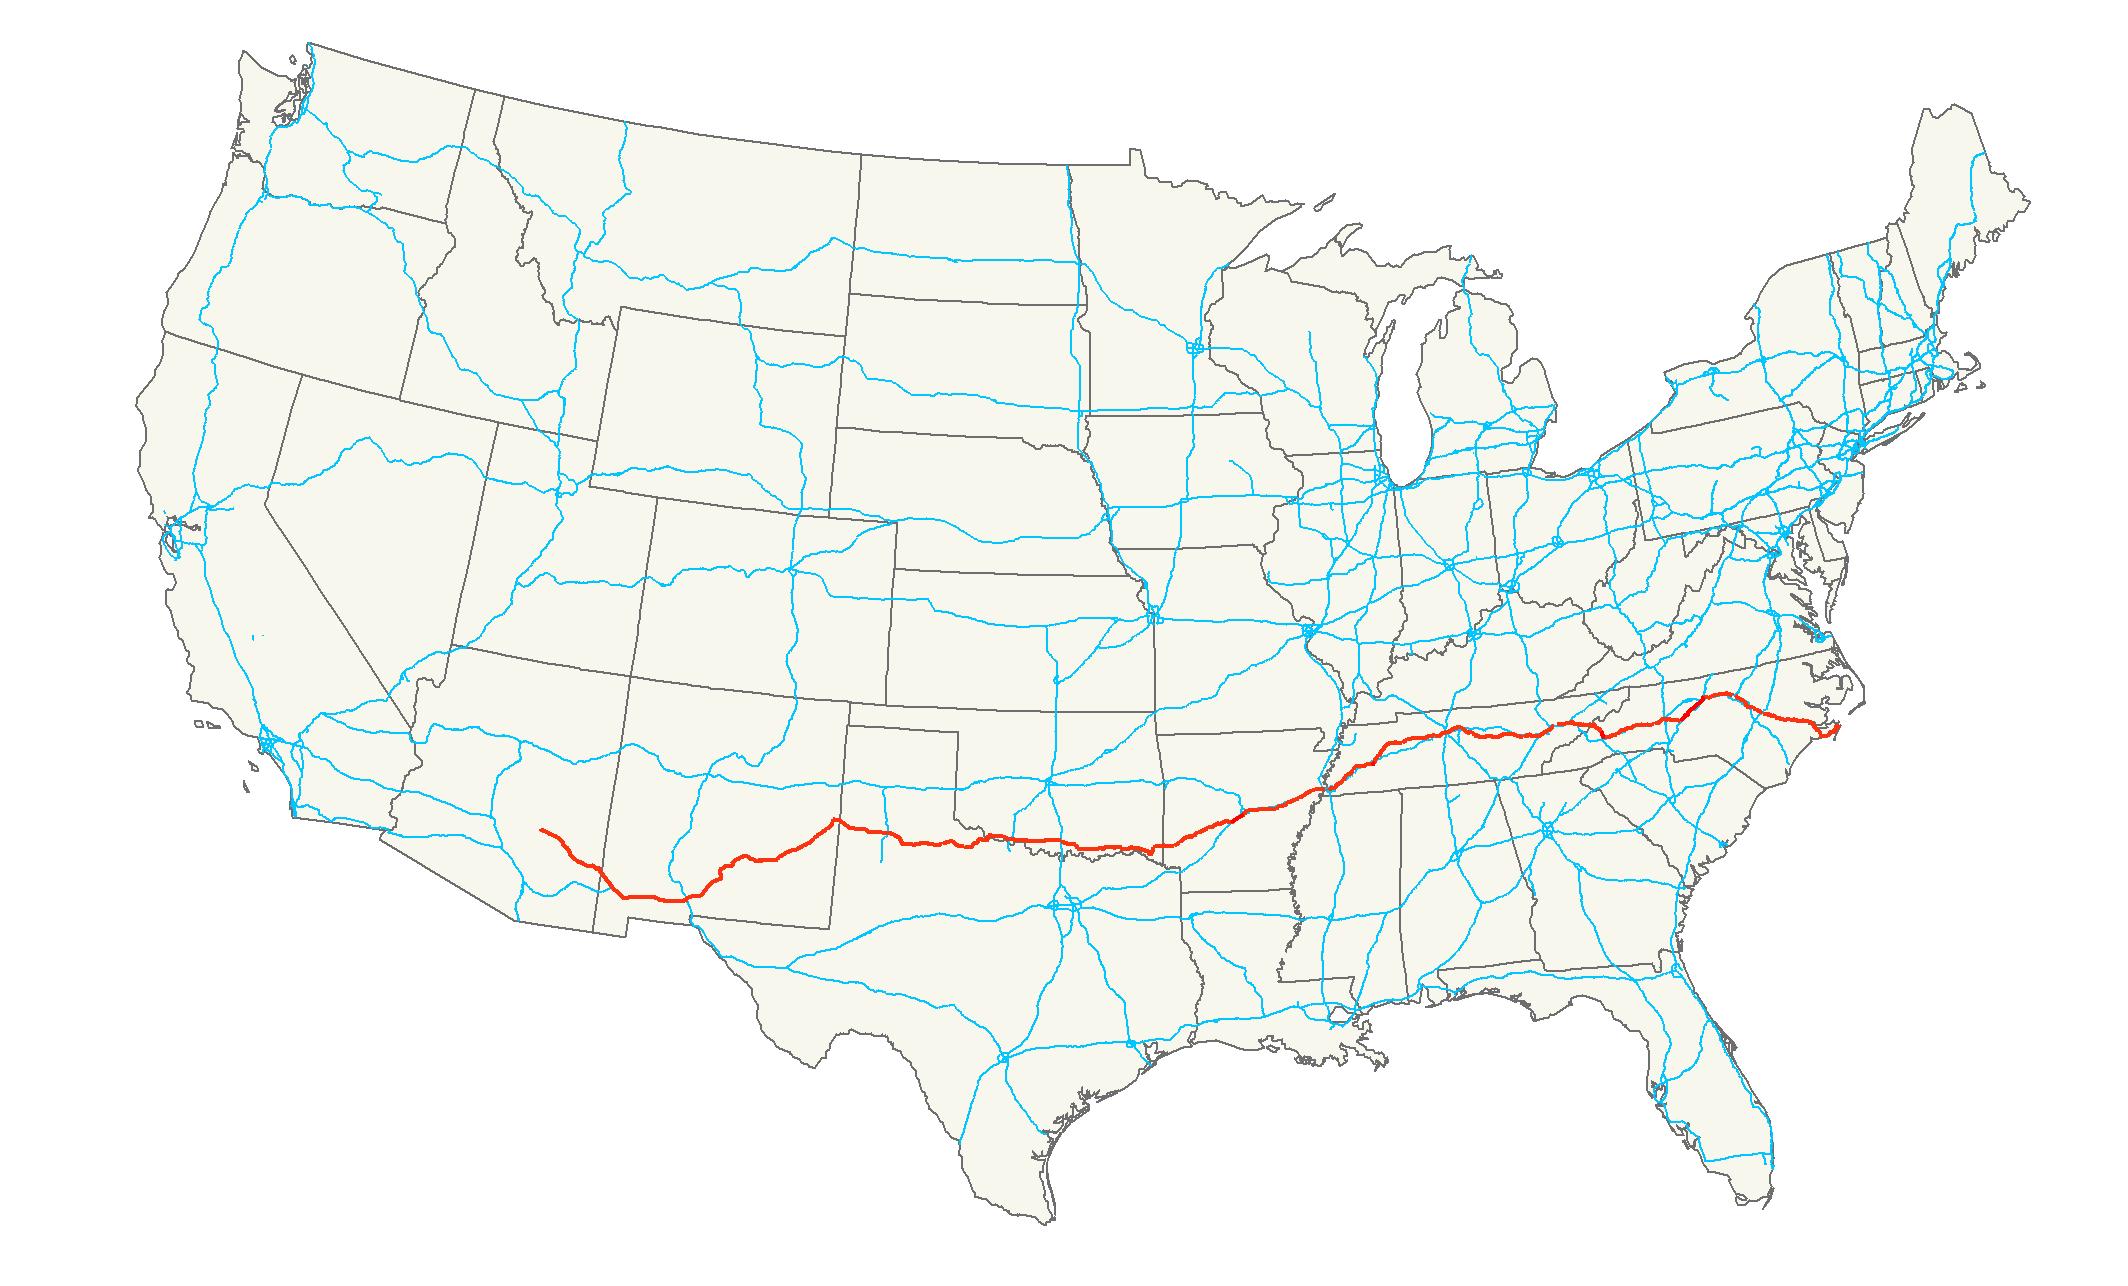 U.S. Route 70 - Wikipedia on map indiana usa, map denver usa, map portland usa, map nashville usa, map colorado usa, map i-65 usa, map texas usa,